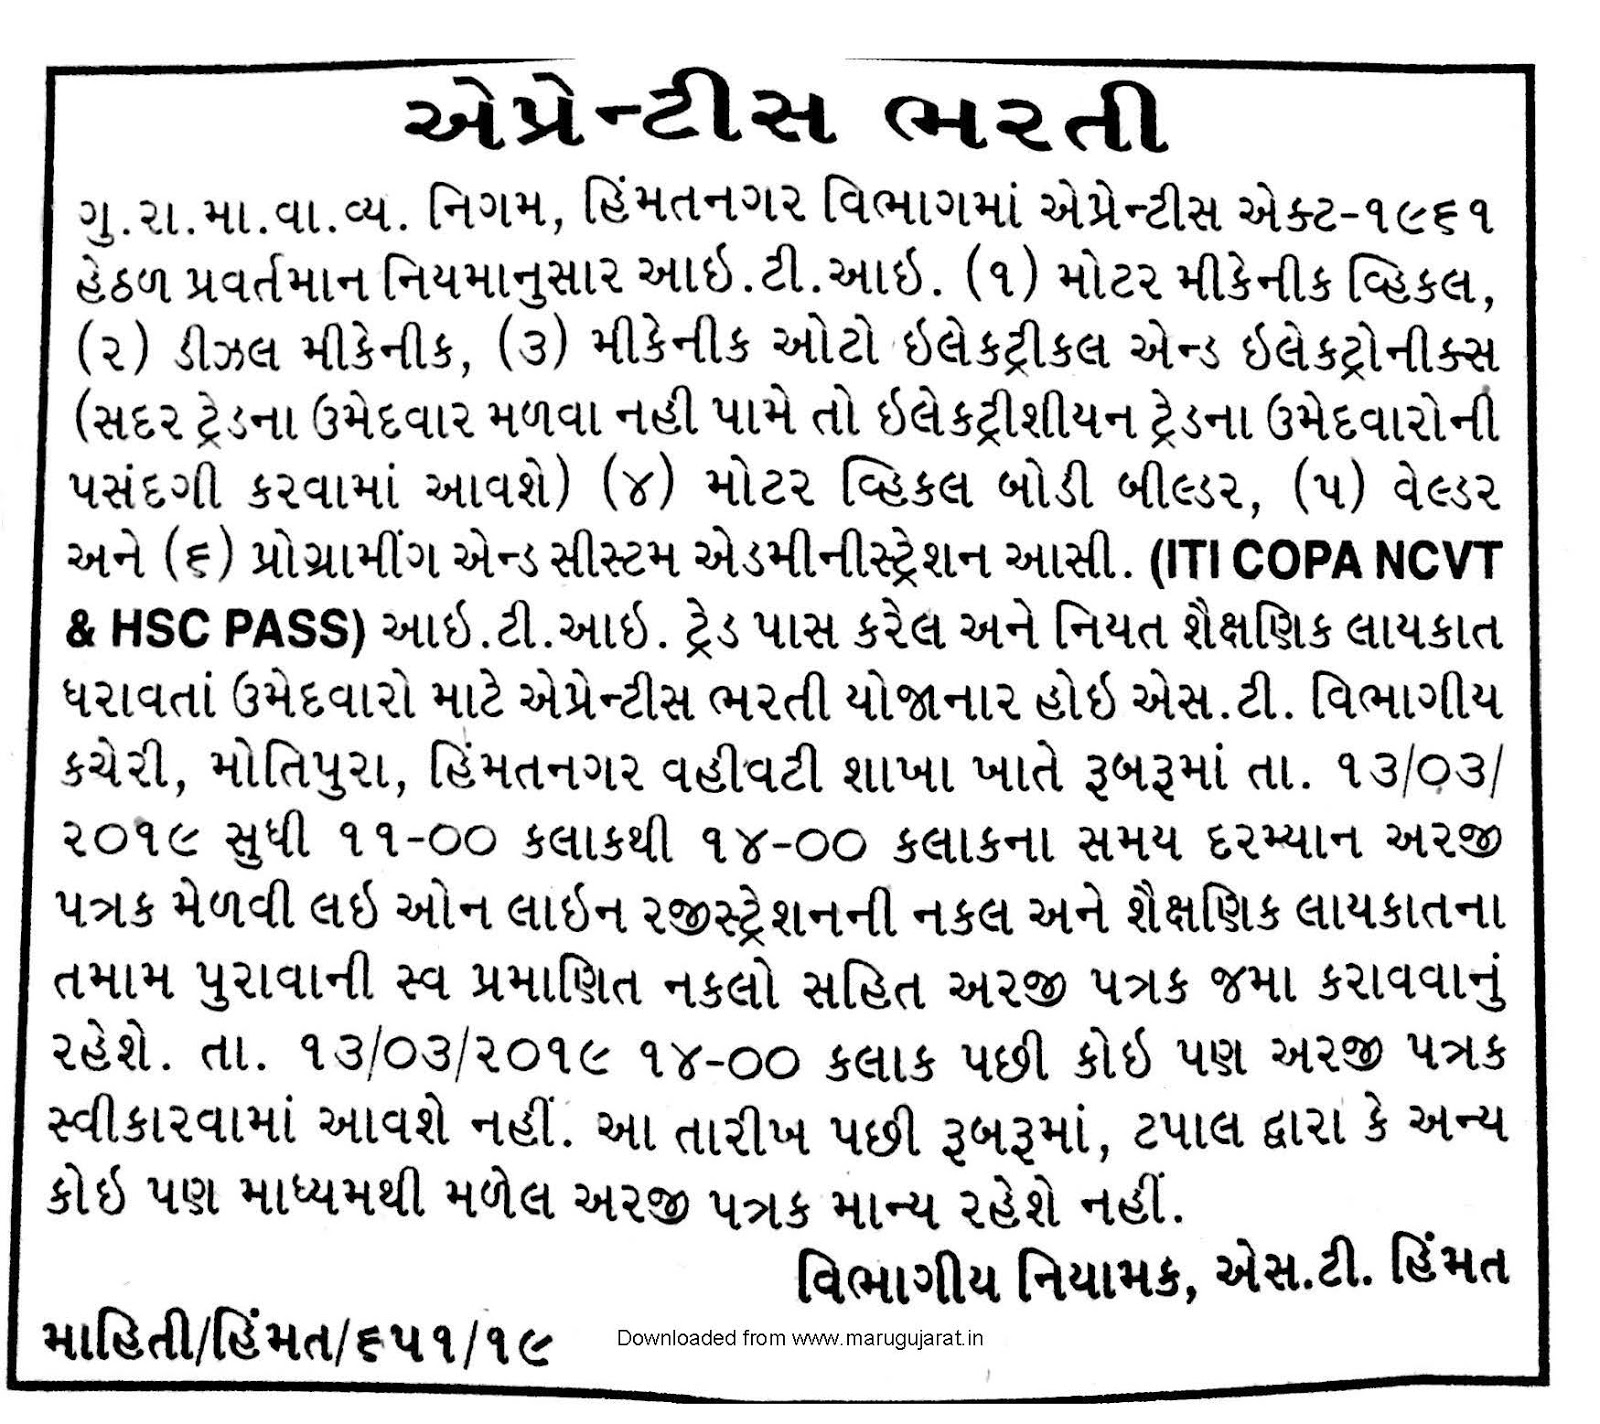 GSRTC Himmatnagar Recruitment for Apprentice Posts 2019 ~ Updates